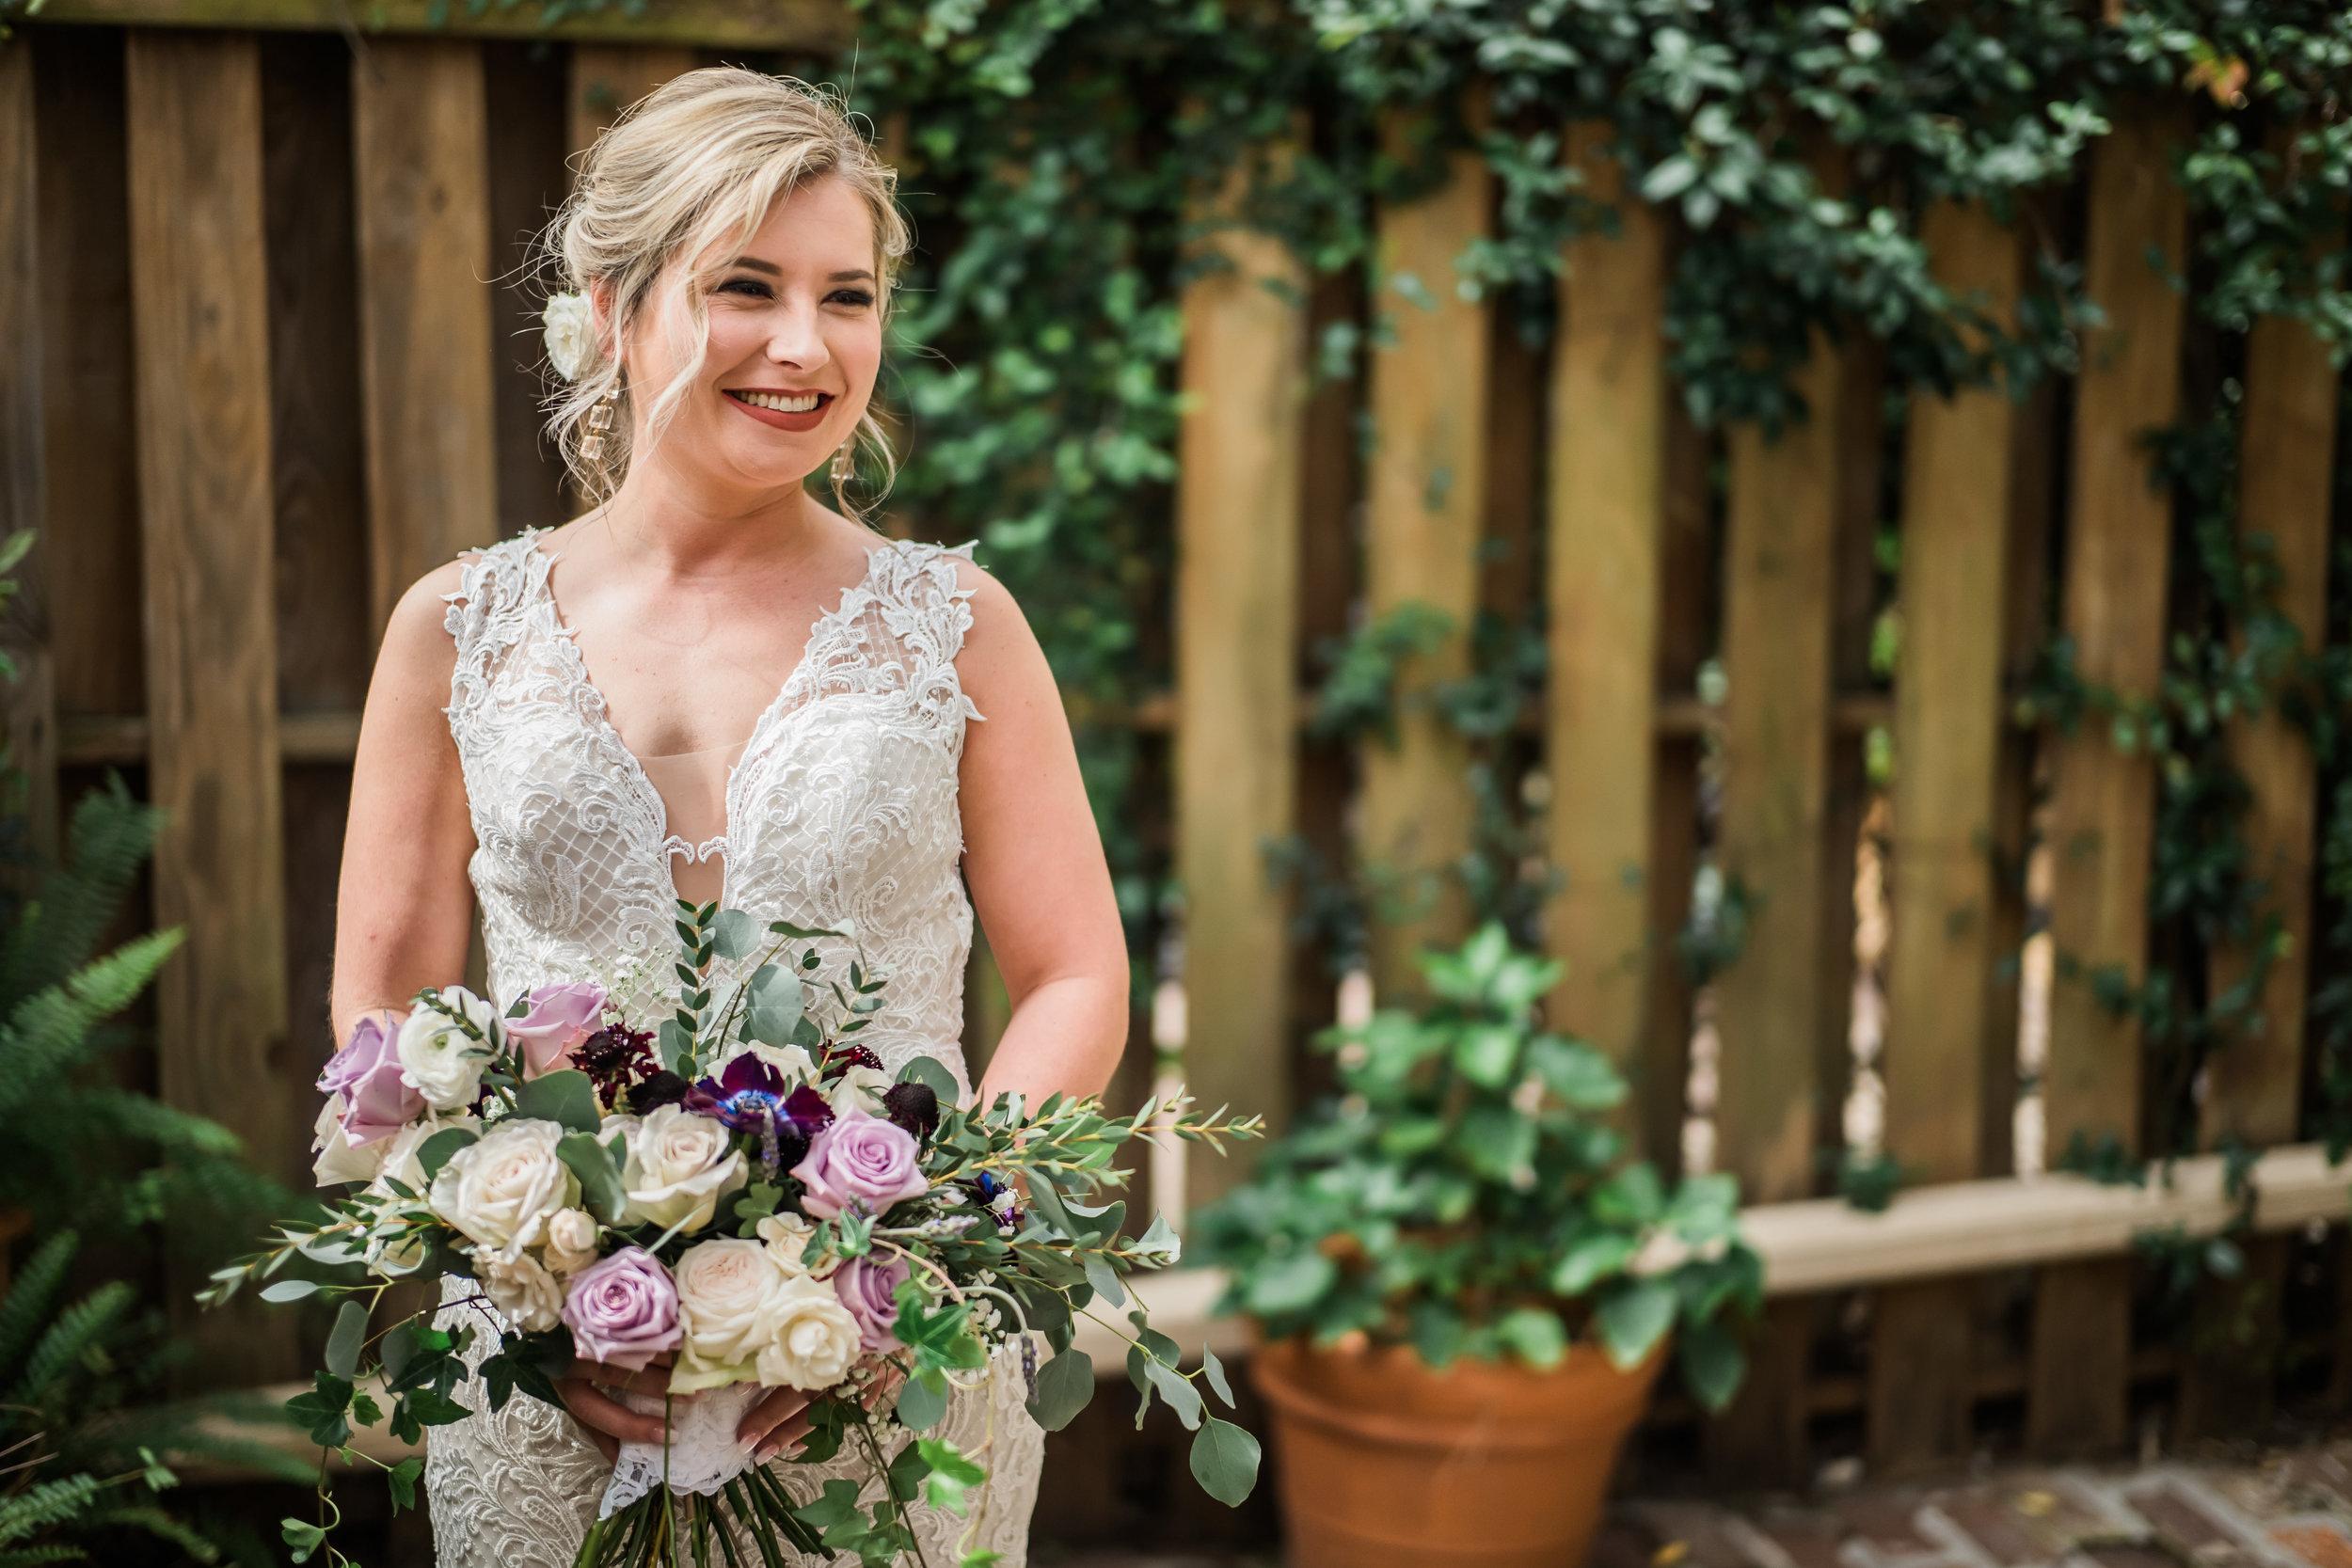 ivory-and-beau-florals-savannah-wedding-florist-savannah-wedding-shop-savannah-wedding-planner-purple-wedding-flowers-inspiration-classic-southern-wedding